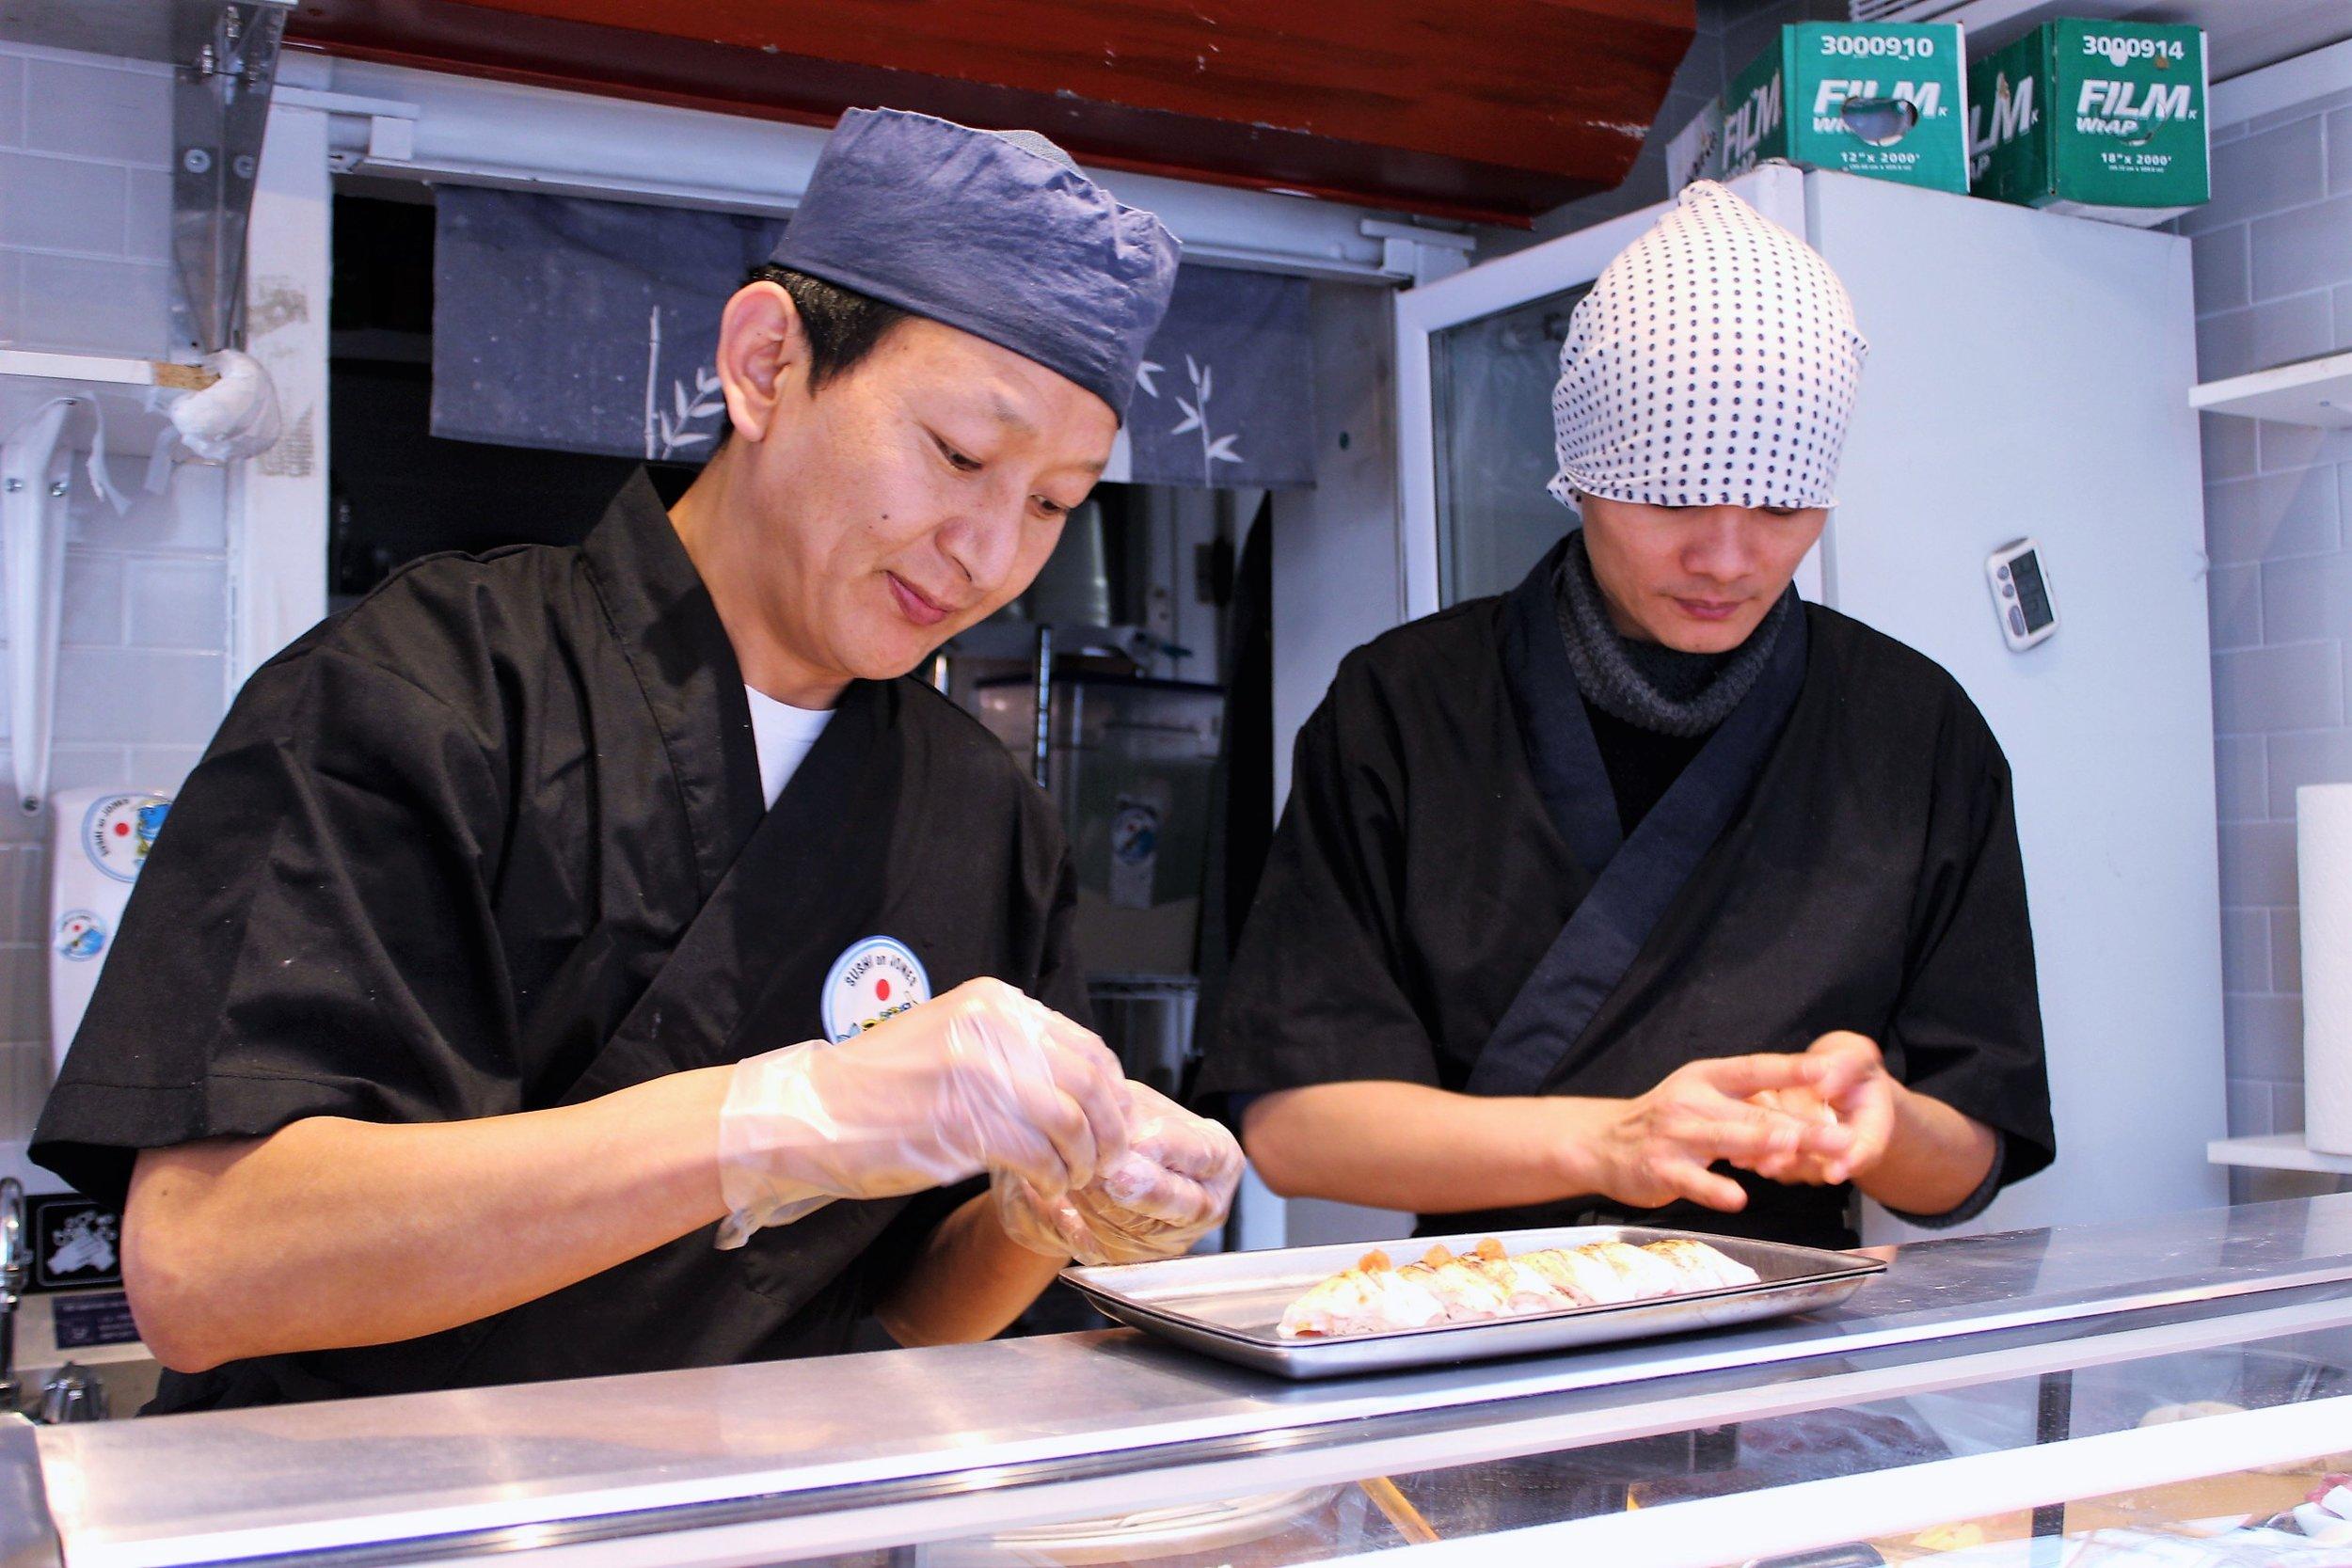 Preparing the sushi!